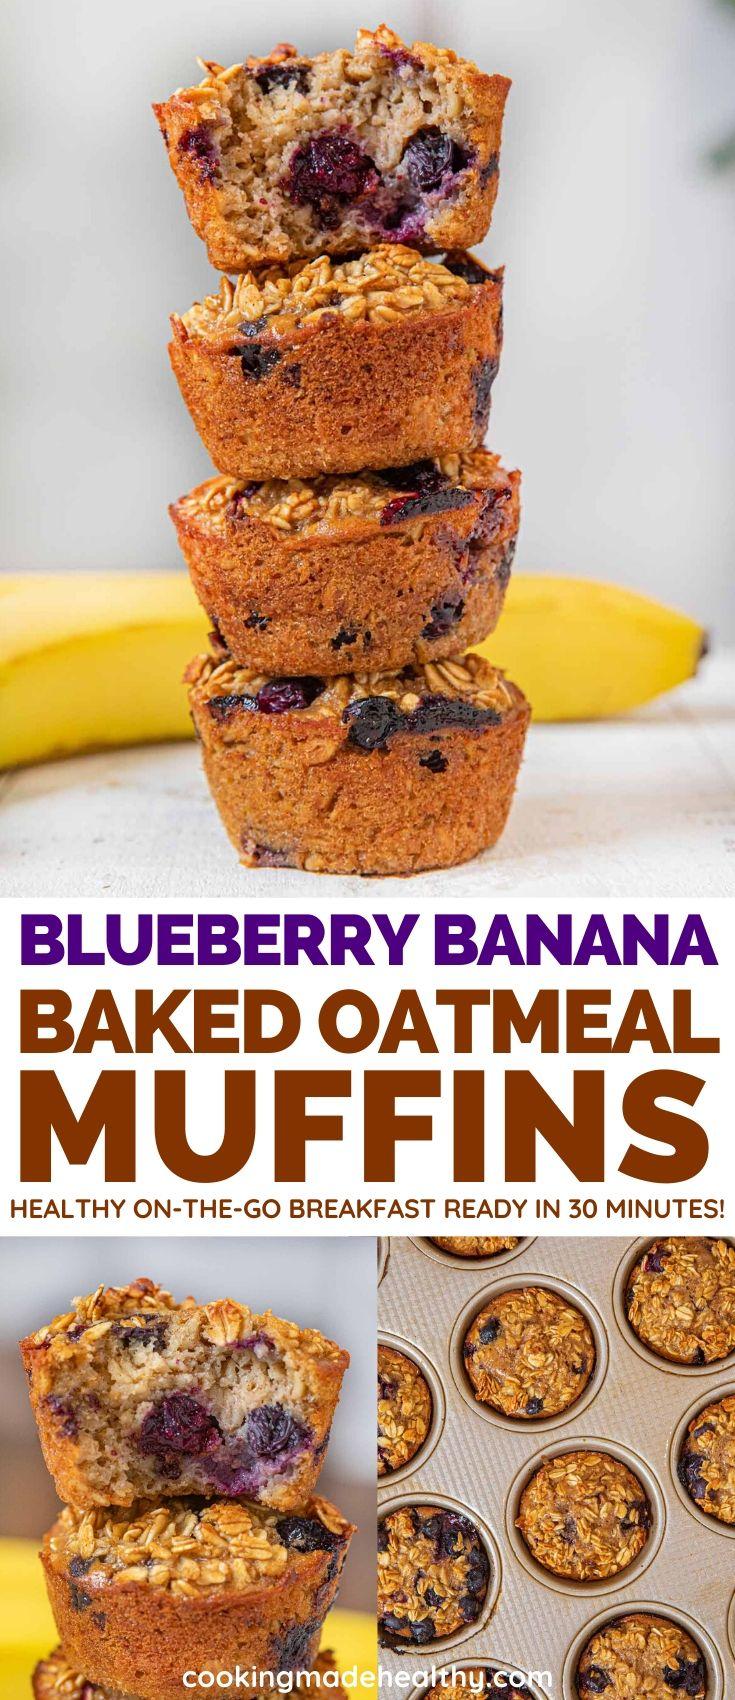 Blueberry Banana Baked Oatmeal Muffins